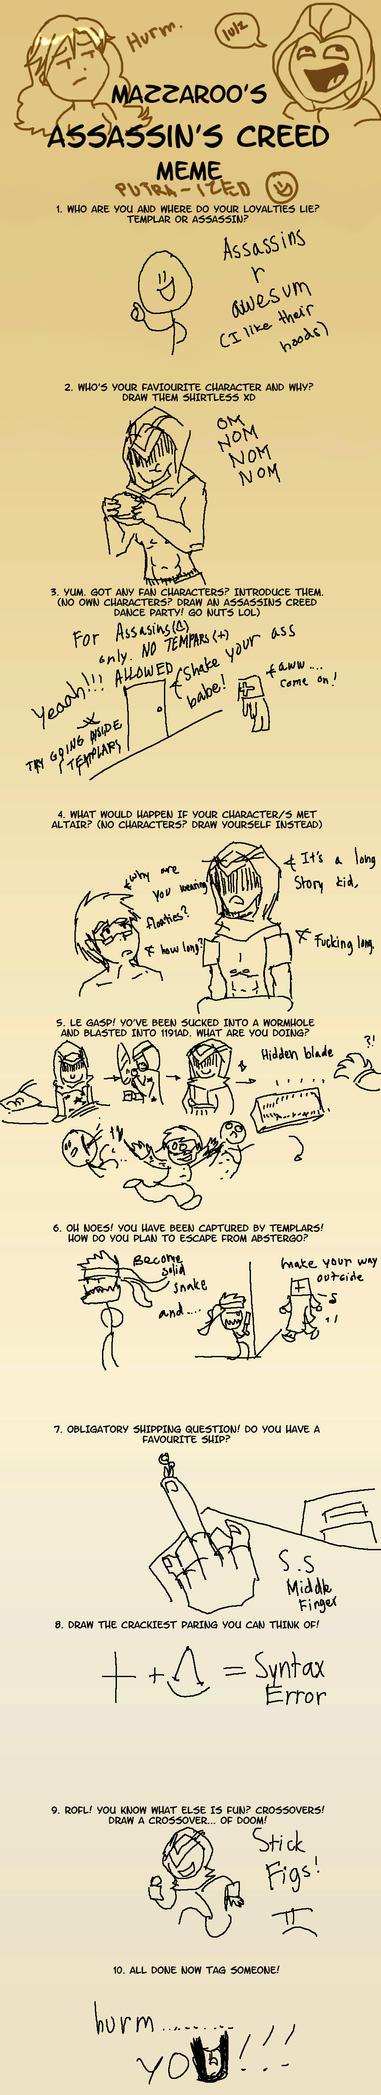 Assassin's creed meme FAIL by putraxxx